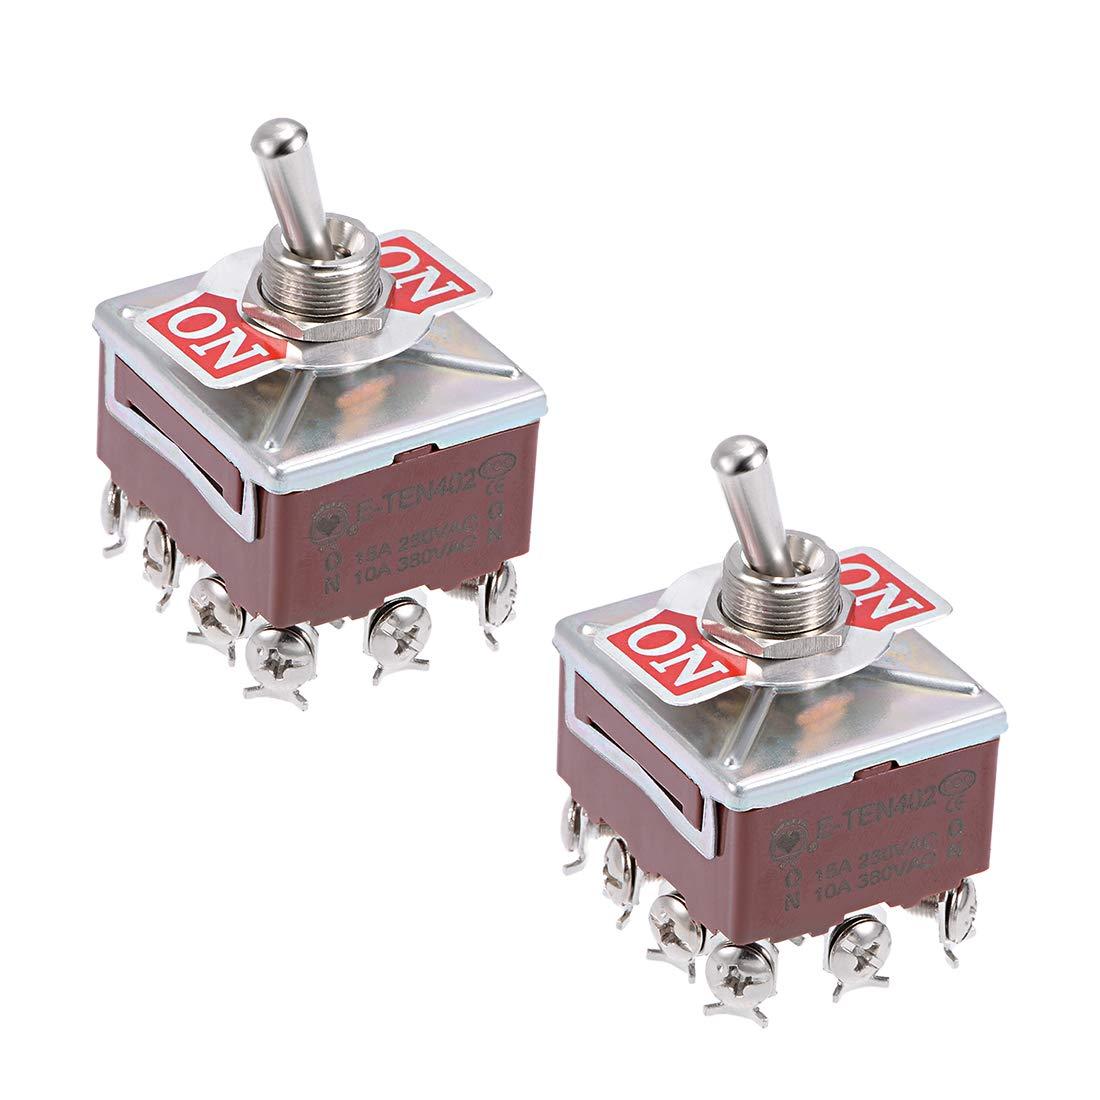 AC 250V//2A 125V//5A 3PDT ON-ON 2 Positions 9 Pins Toggle Switch 8 Pcs